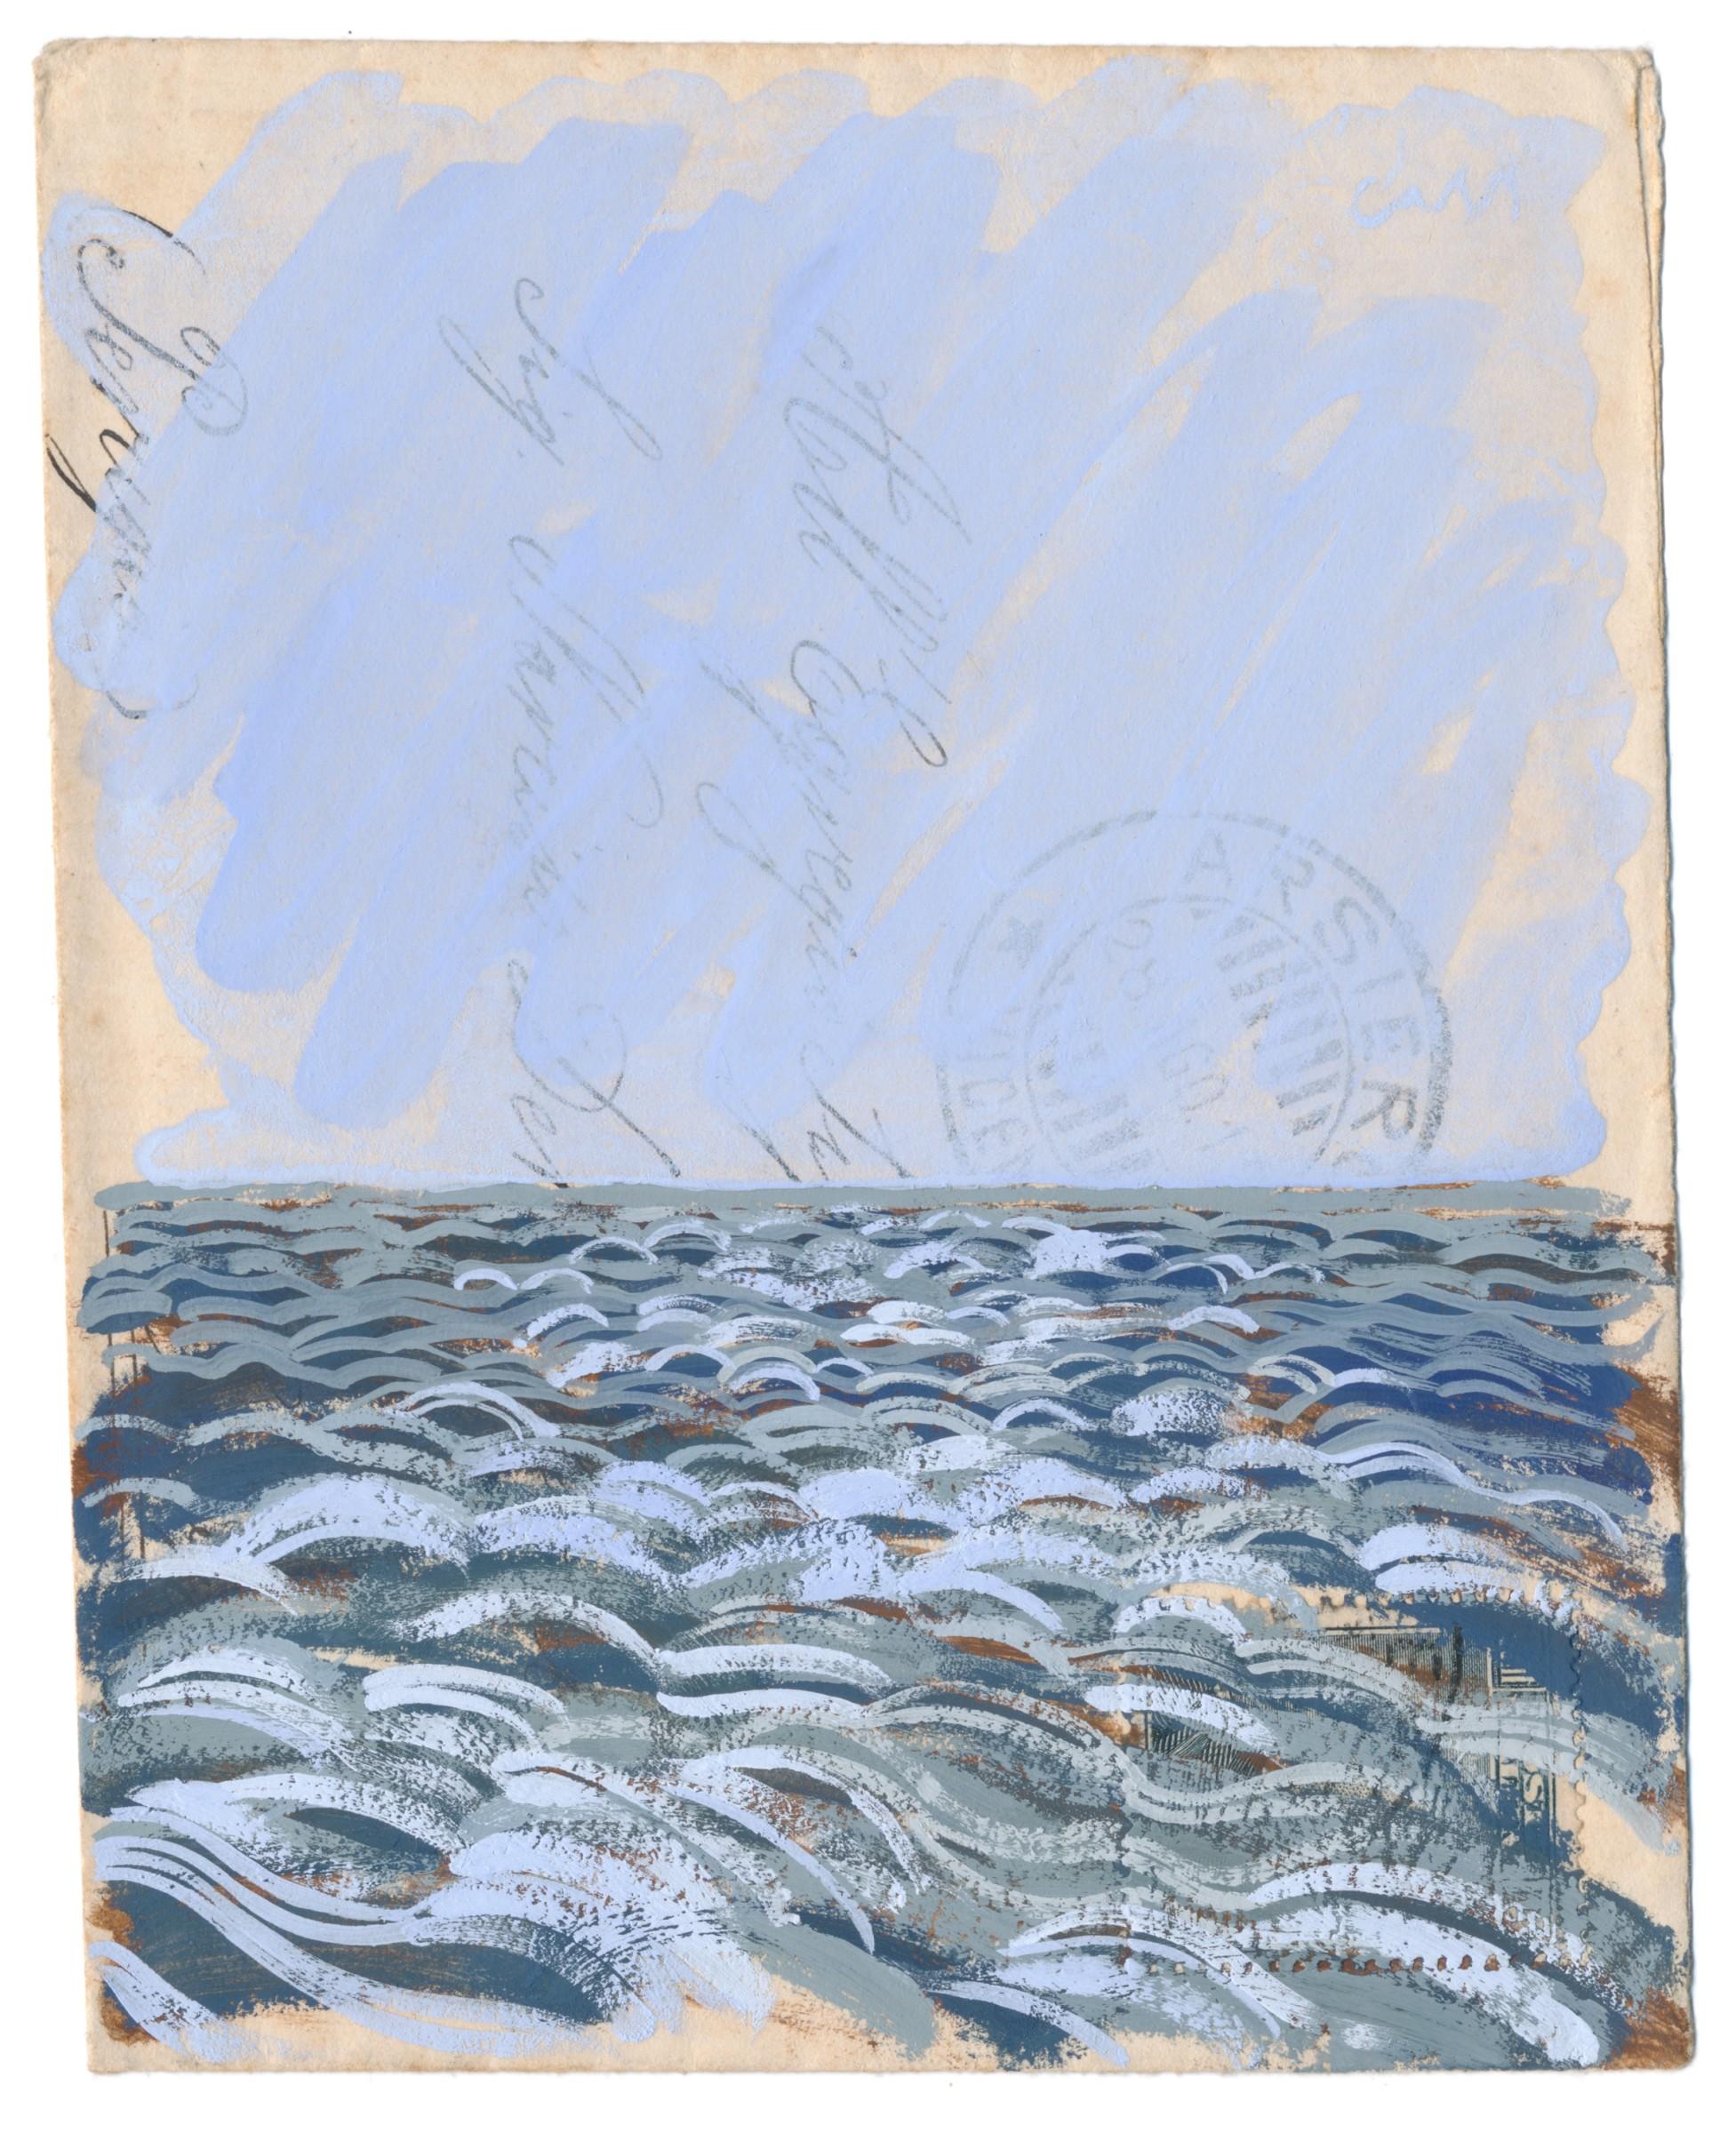 <span class=&#34;link fancybox-details-link&#34;><a href=&#34;/exhibitions/12/works/artworks_standalone9808/&#34;>View Detail Page</a></span><div class=&#34;artist&#34;><span class=&#34;artist&#34;><strong>David Cass</strong></span></div><div class=&#34;title&#34;><em>Mor Breizh</em></div><div class=&#34;medium&#34;>gouache</div>